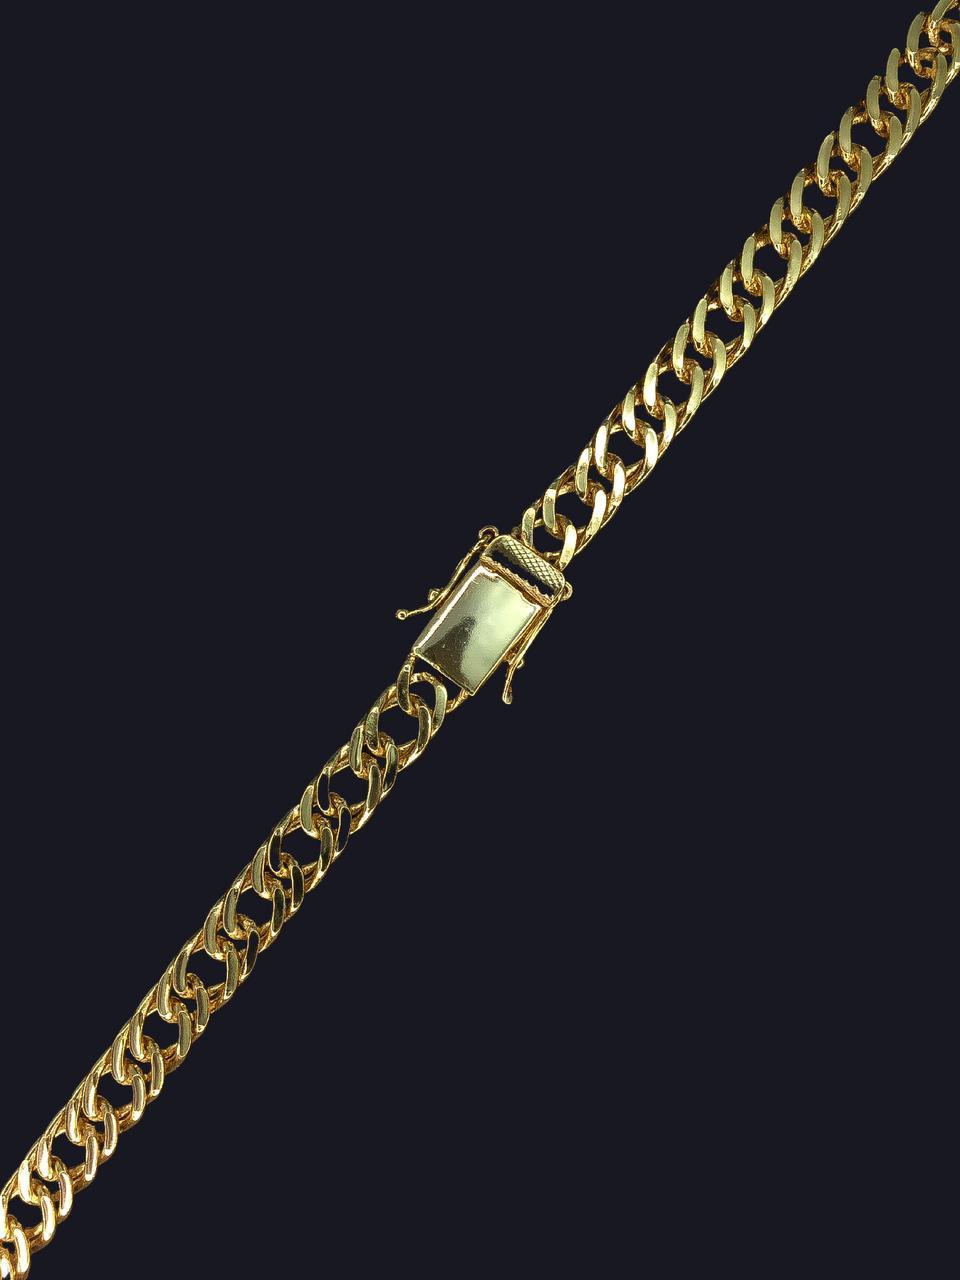 Corrente Lacraia -  10 milímetros - 70 Centímetros - fecho Gaveta trava dupla    - Banhado a ouro 18 k